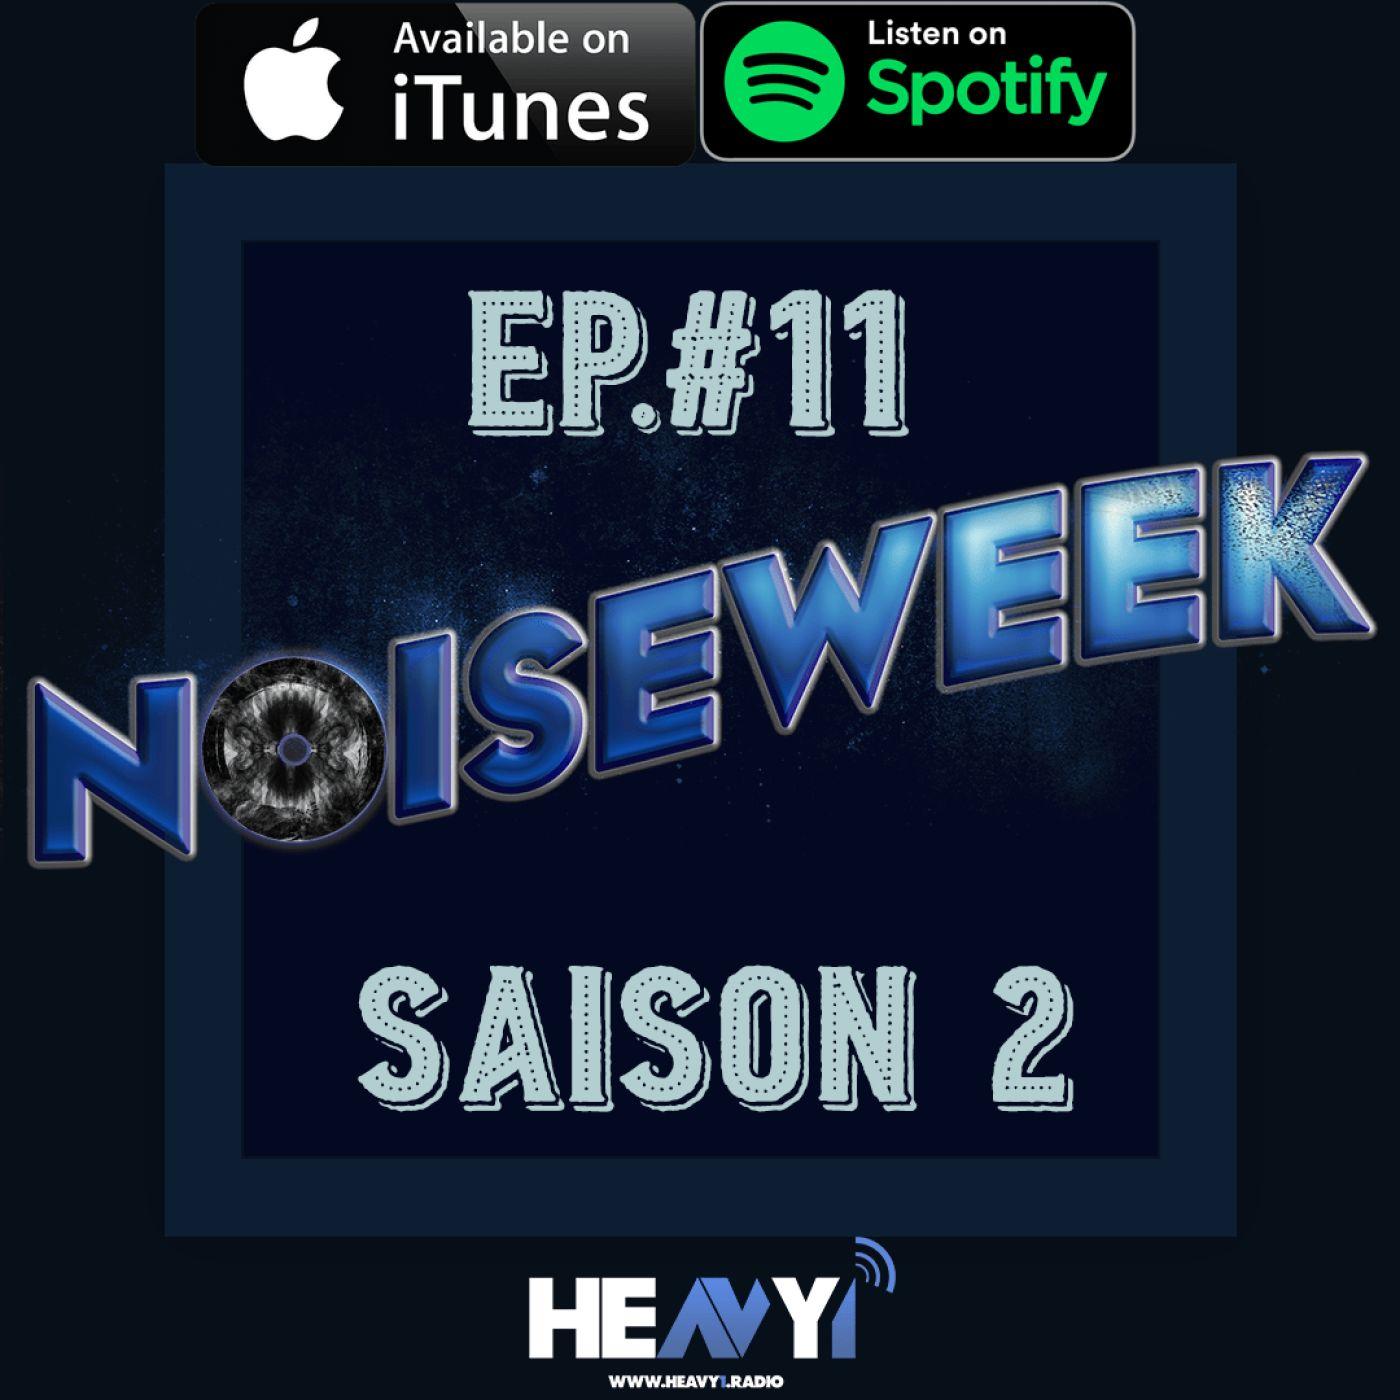 Noiseweek #11 Saison 2